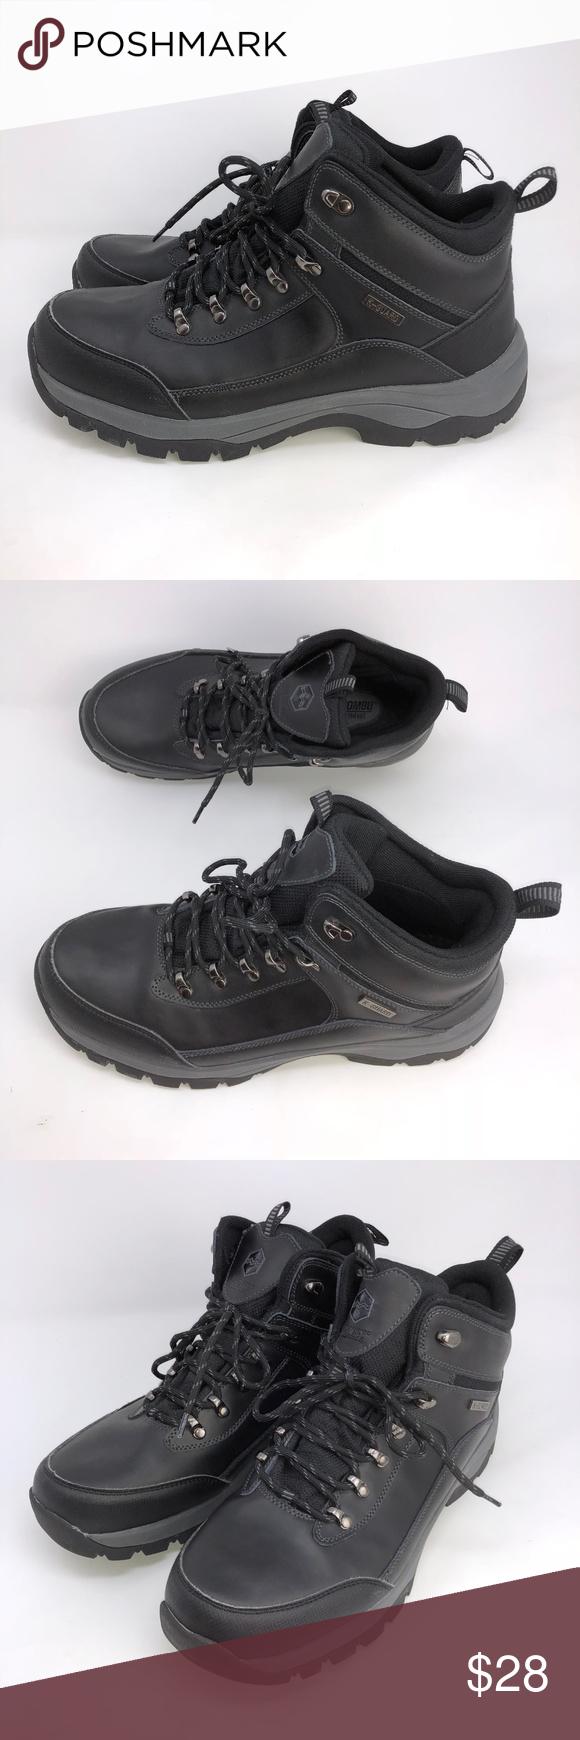 d067fd02ae5 Khombu Summit Men's Waterproof Leather Hiking Boot NEW Khombu Summit ...